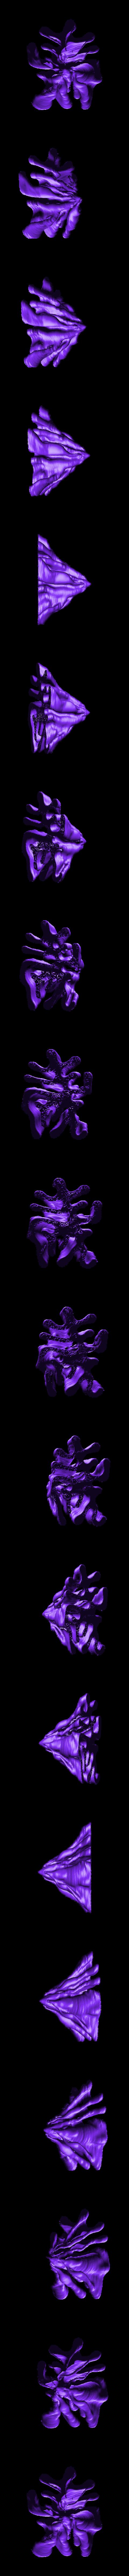 creamy_mountain1.stl Download free STL file Weird terrain collection • 3D printer object, ferjerez3d